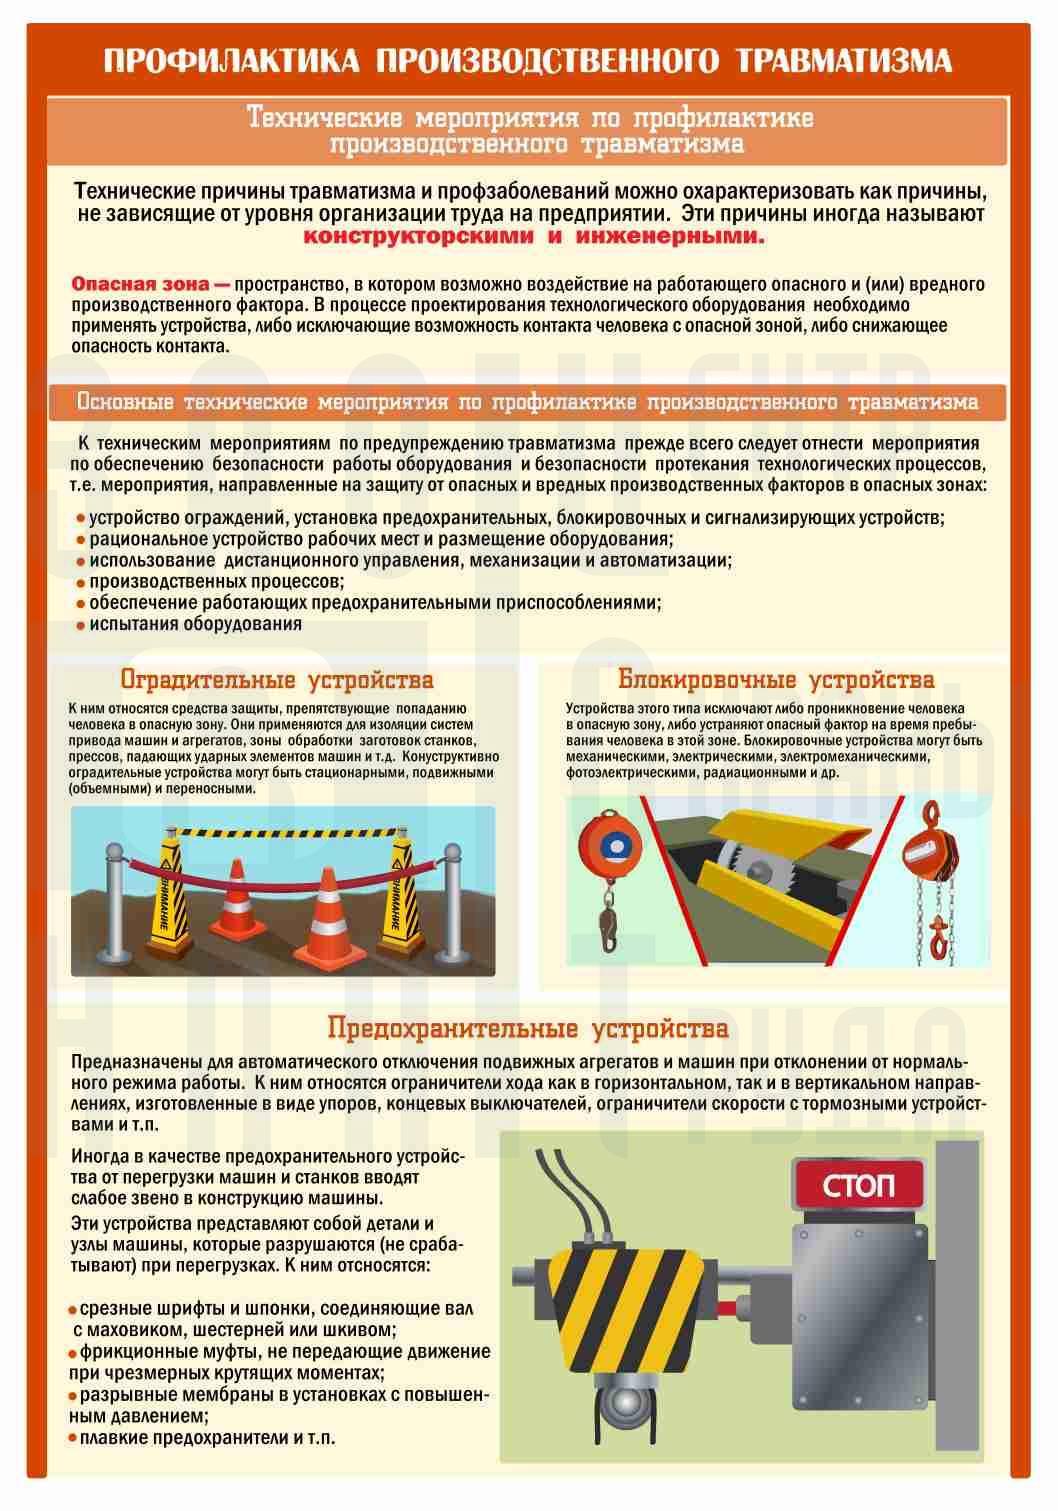 Снижение травматизма. профилактика | ohranatruda31.ru